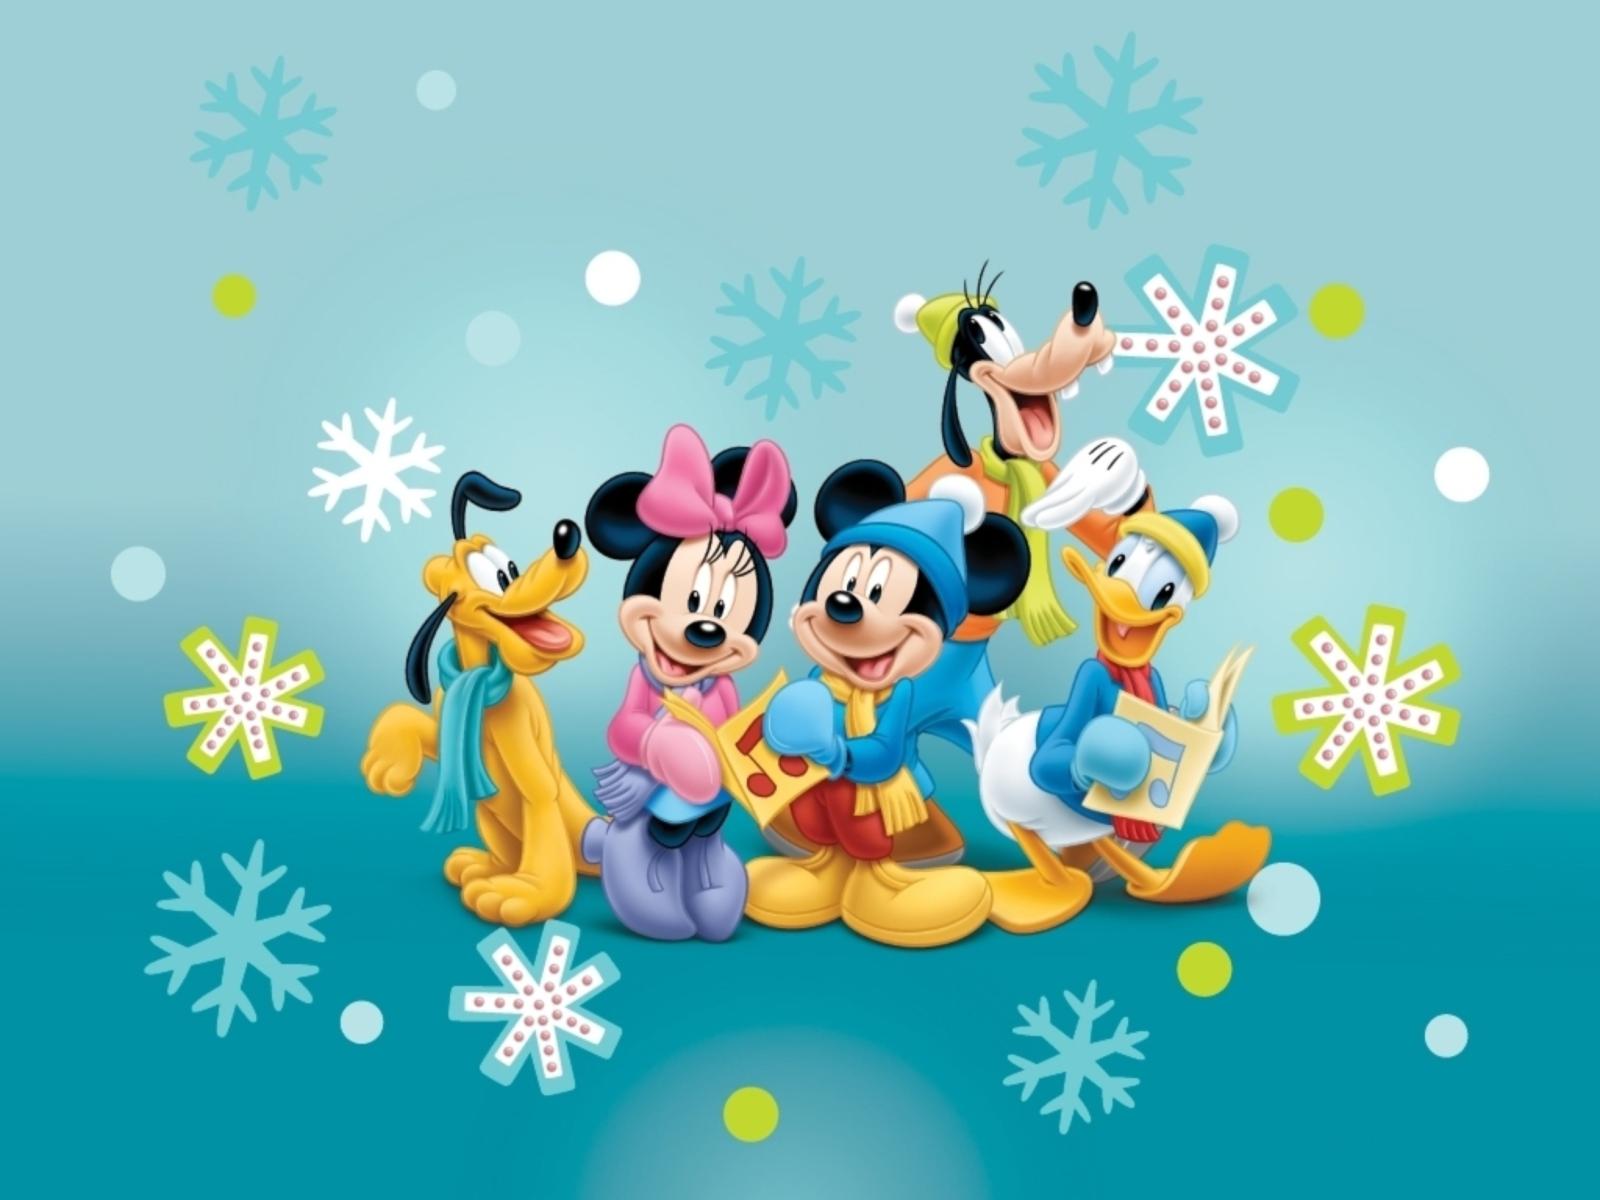 49 Disney Free Wallpaper For Desktops On Wallpapersafari